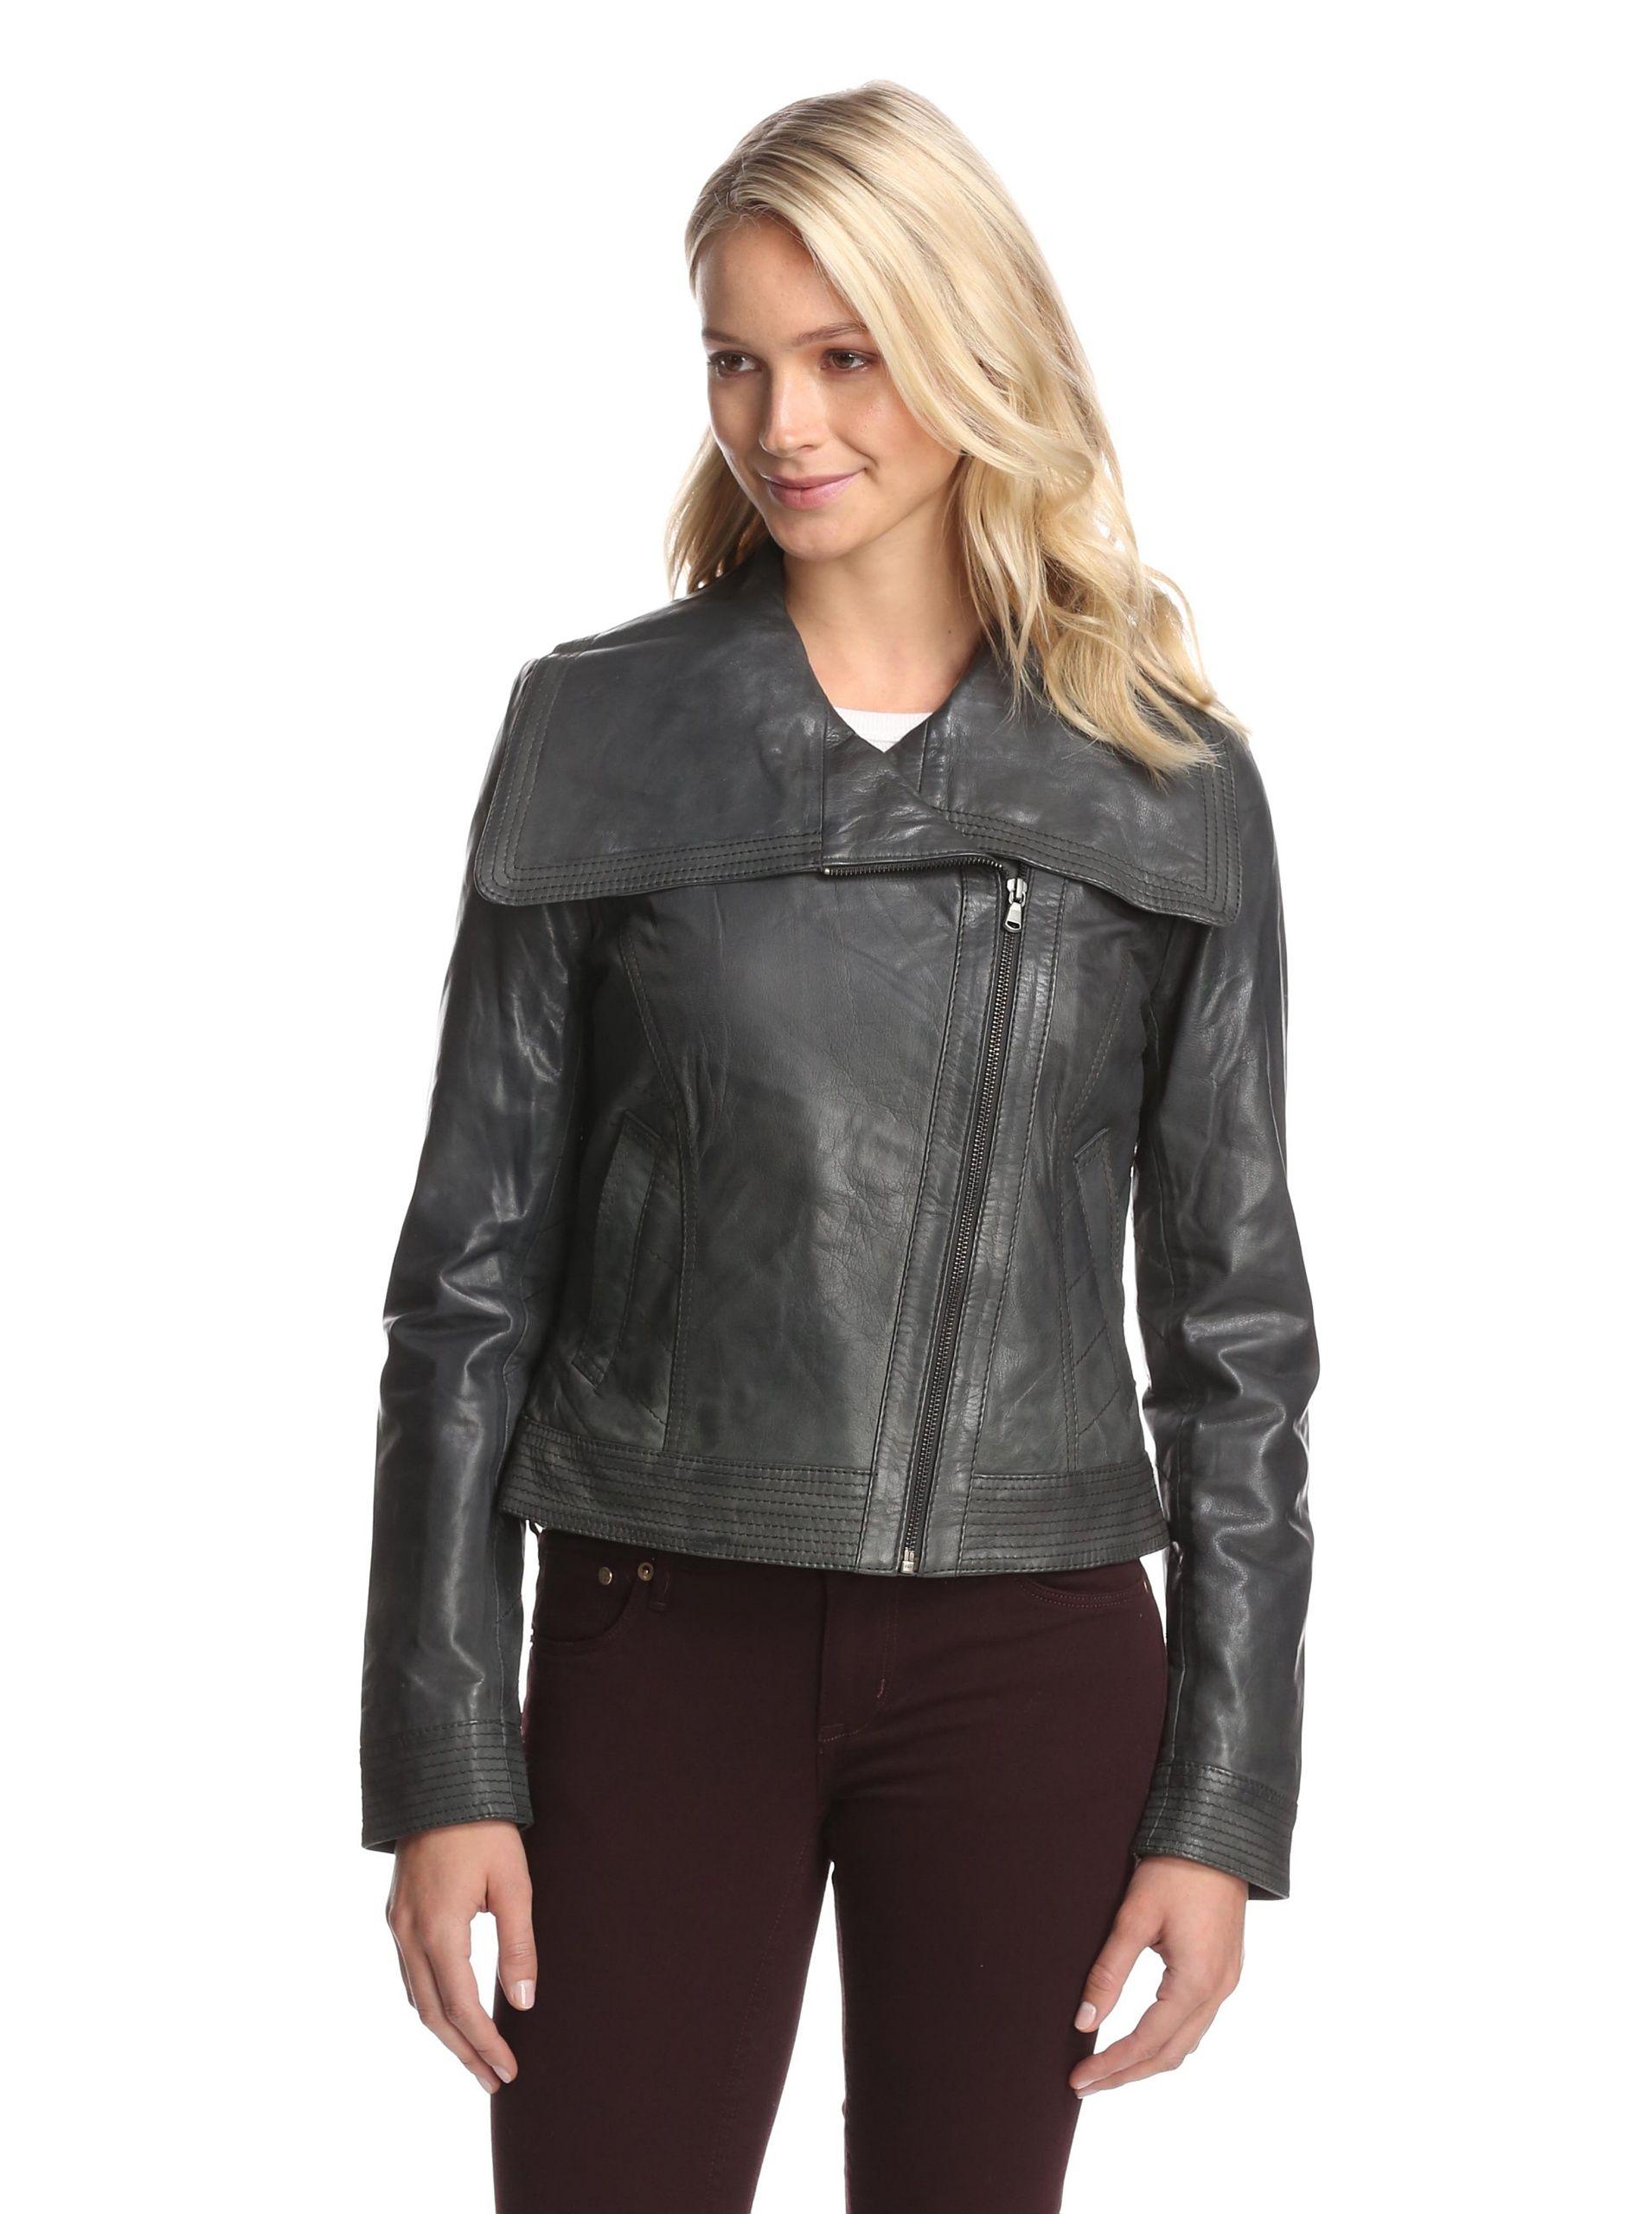 Bagatelle Women S Leather Moto Jacket Dark Green Supple And